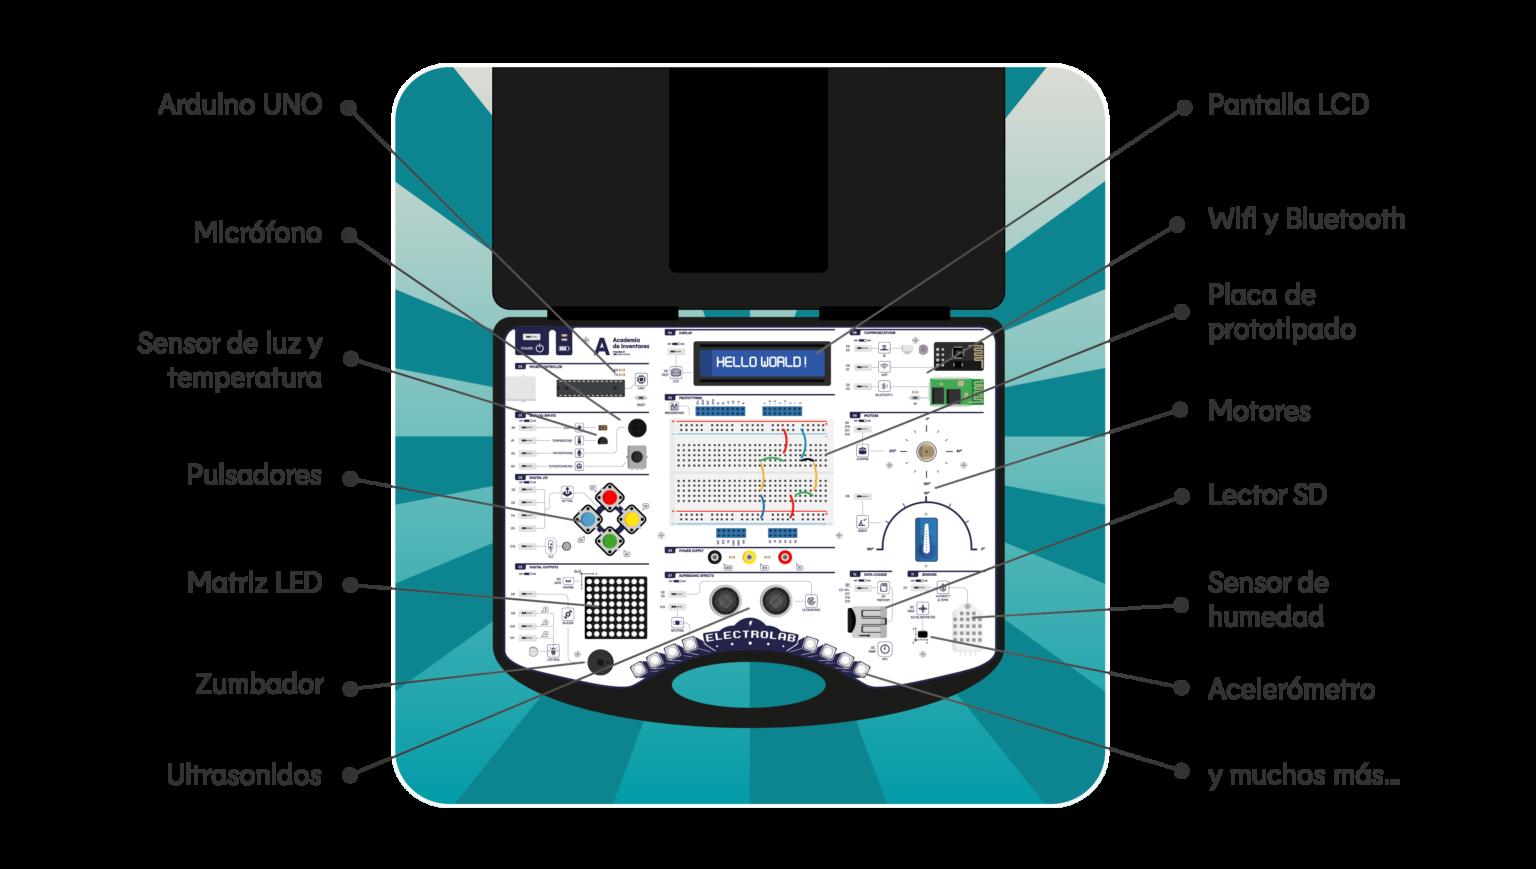 Kit de robótica educativa